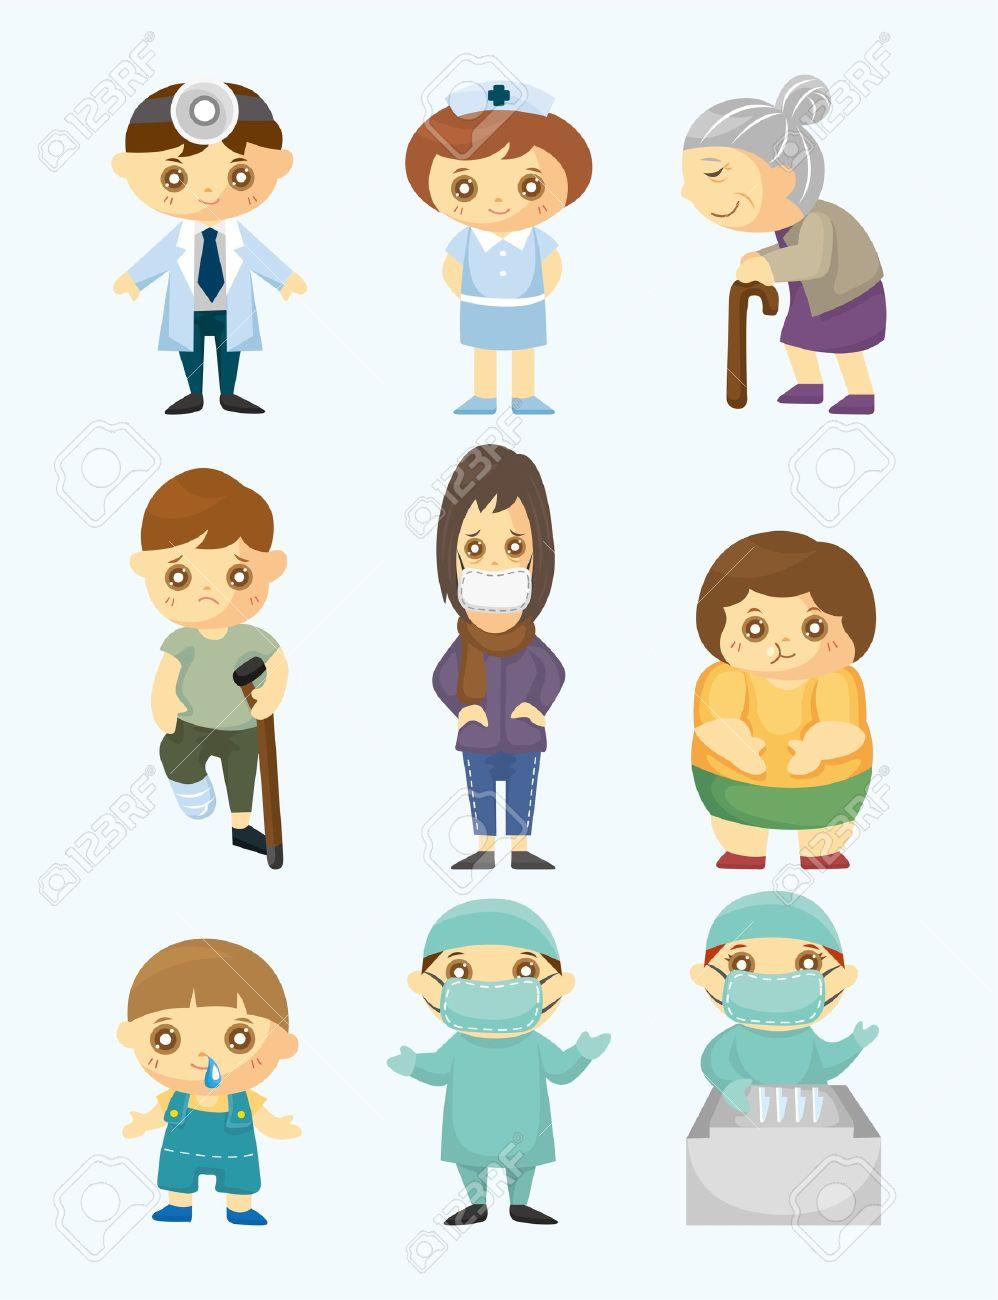 Doctors and Patient people Stock Vector - 11529529